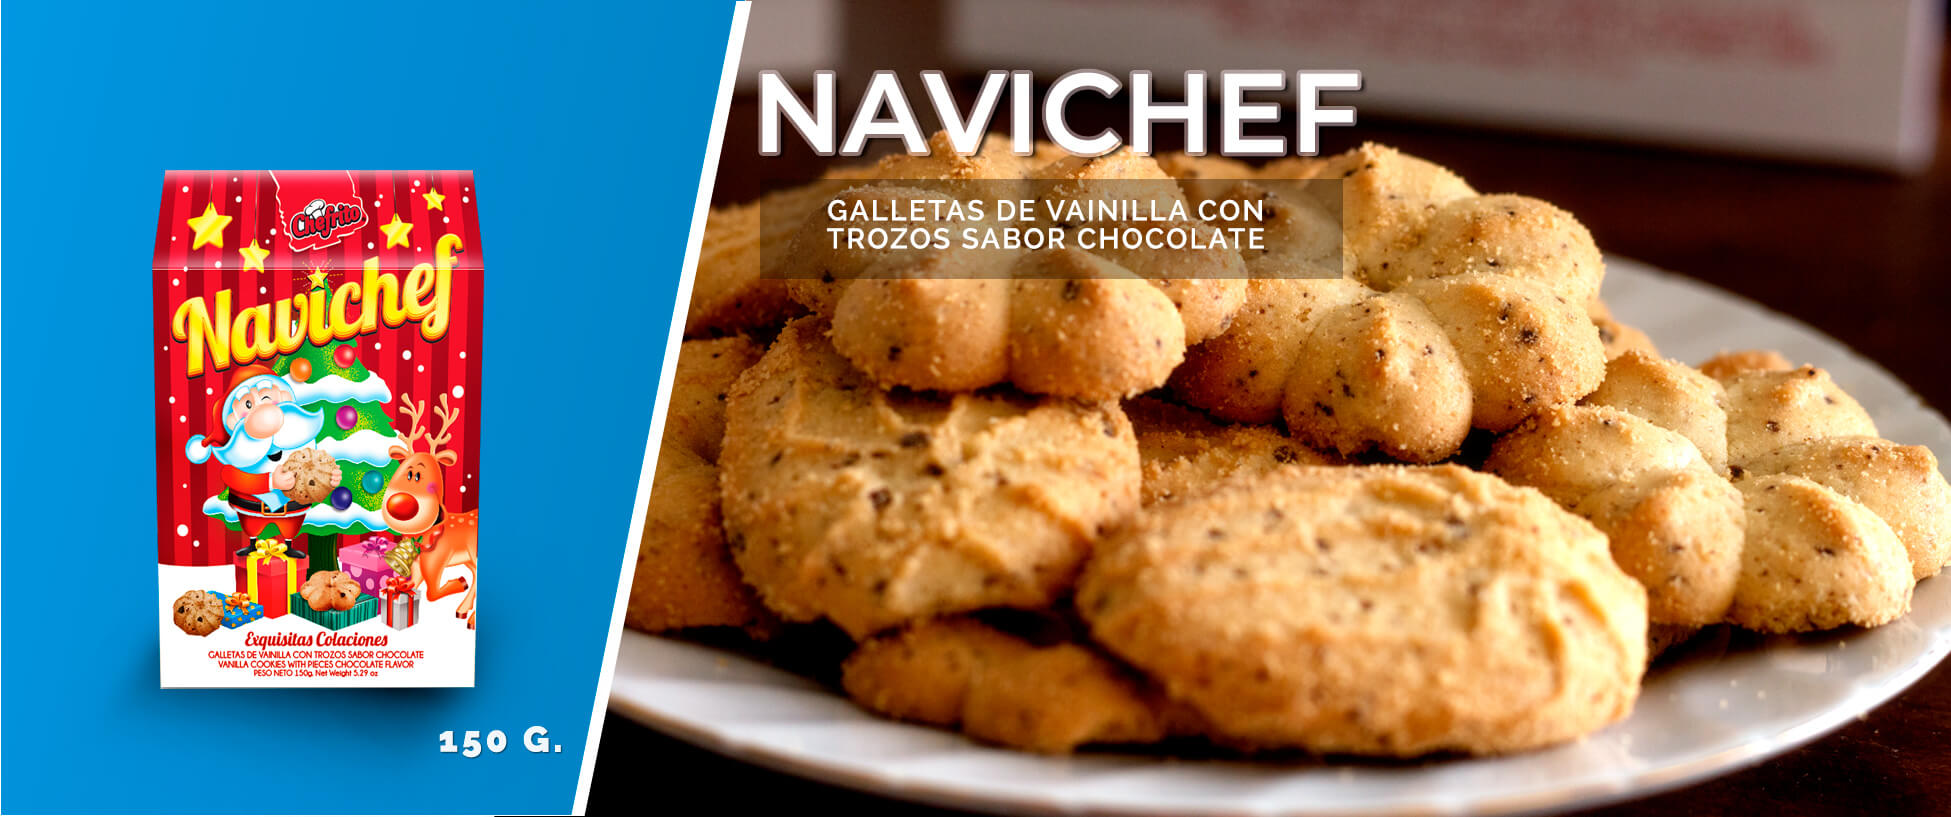 Navichef 6